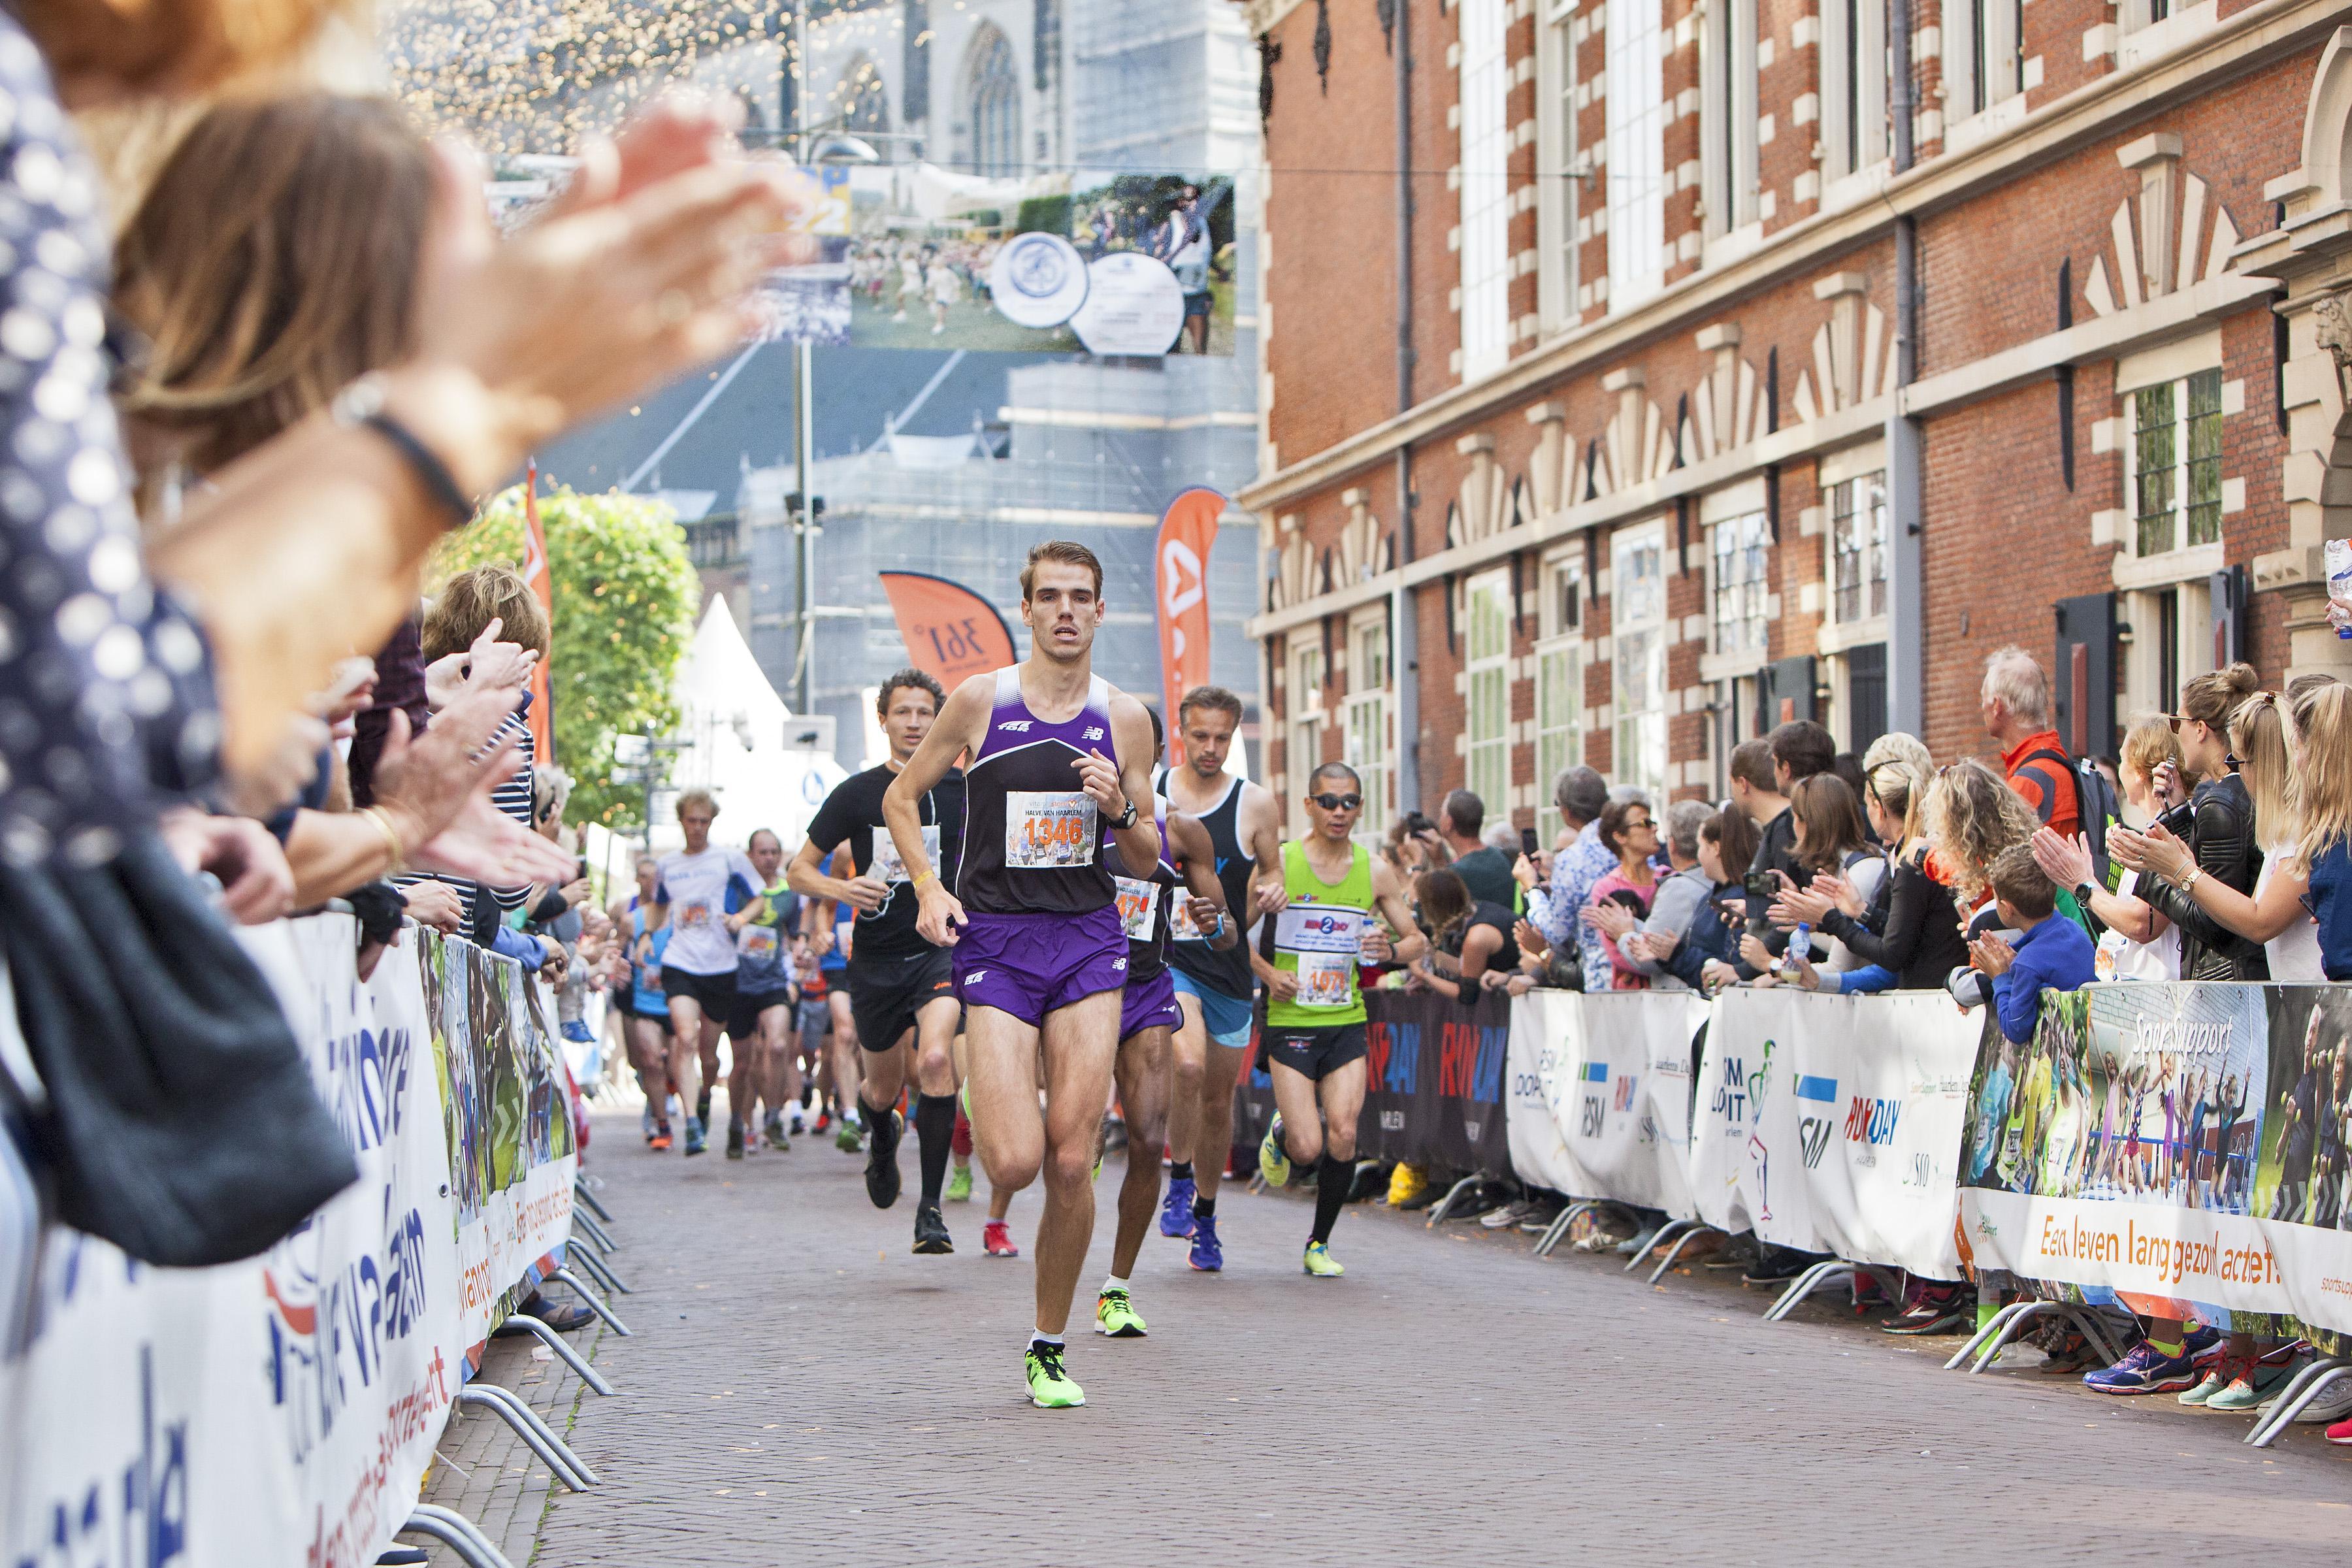 Halve van Haarlem: Nazomers hardloopfeest [video]